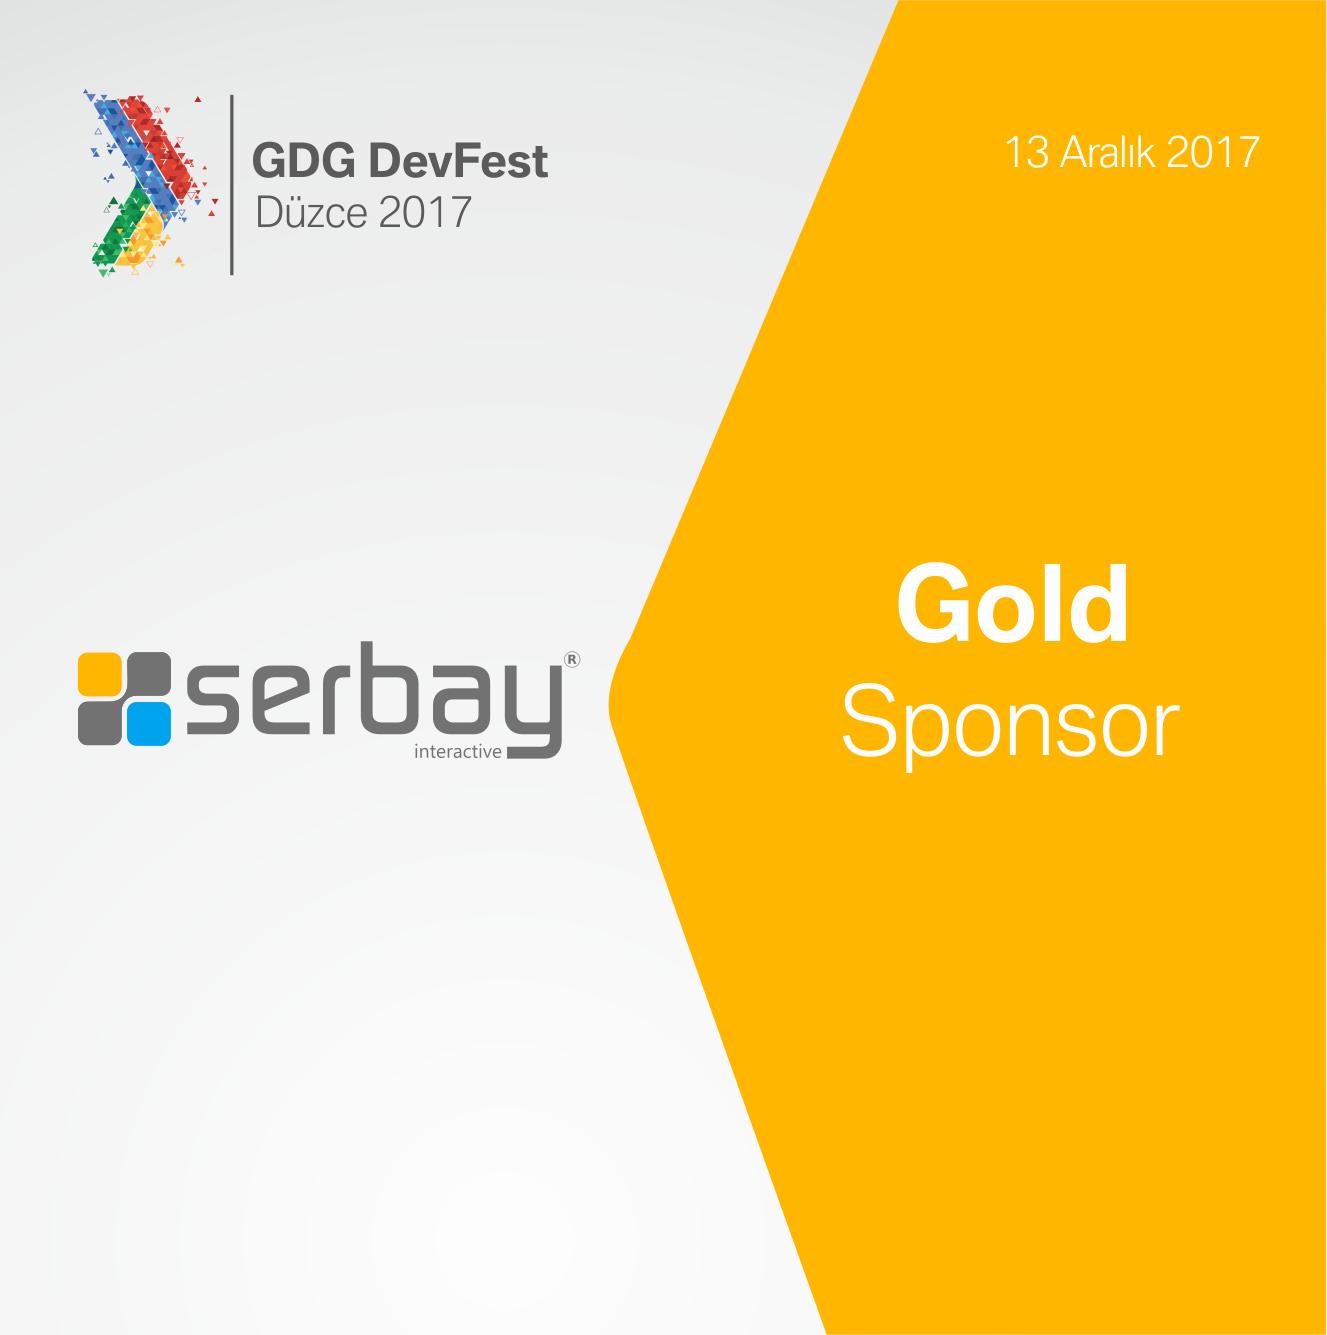 GDG DevFest Düzce 2017 Gold Sponsor: Serbay Interactive